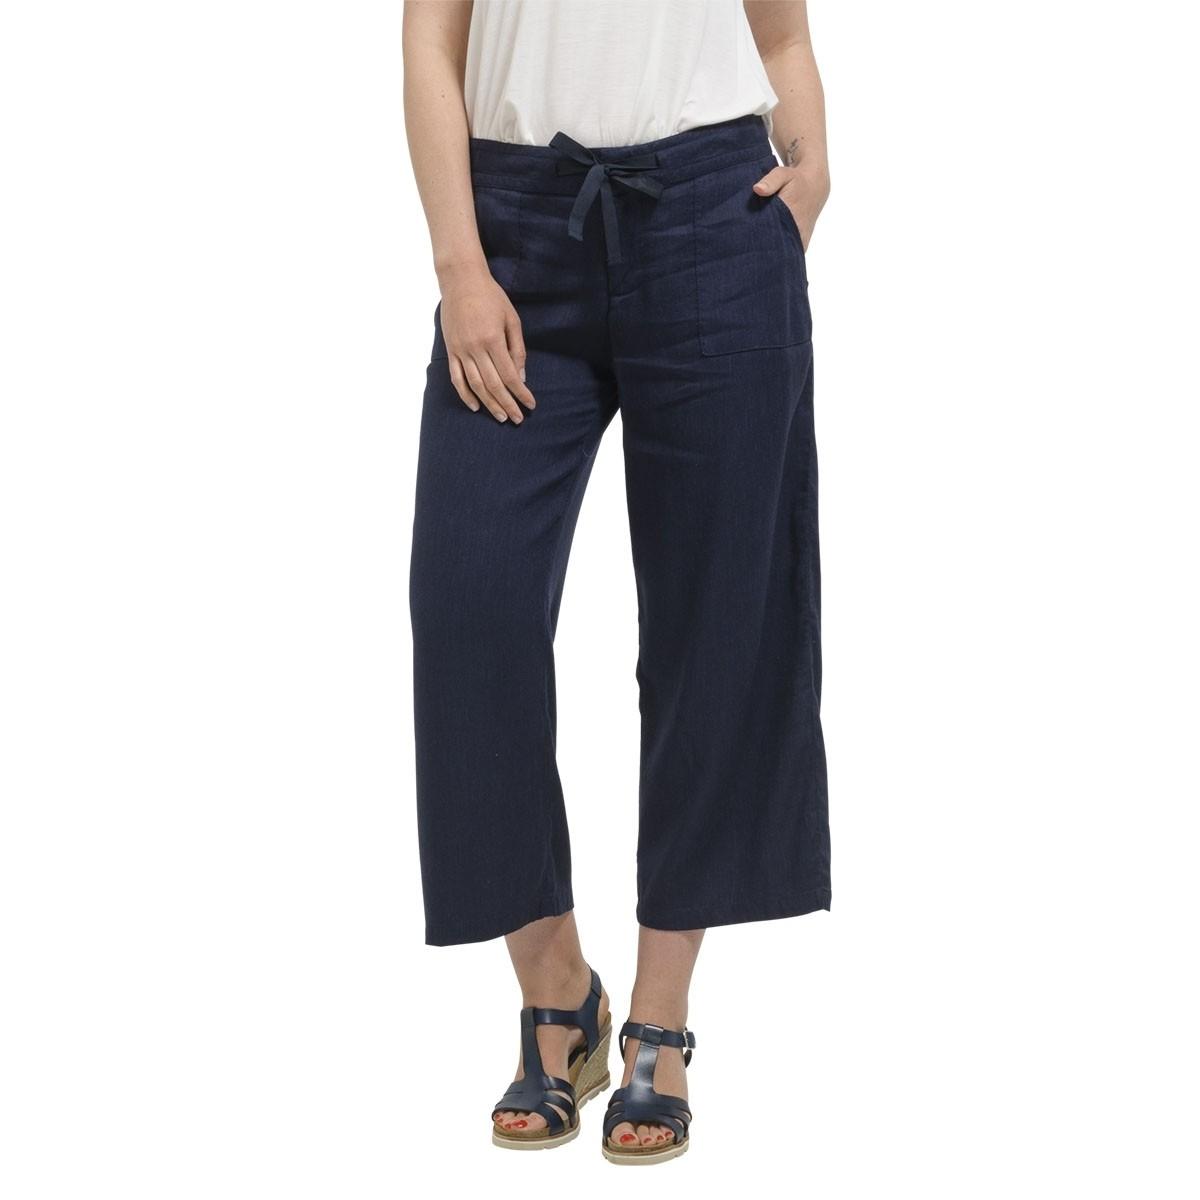 oxv915794-xdpma-1-pantalon-ravi-marine-fonce.jpg